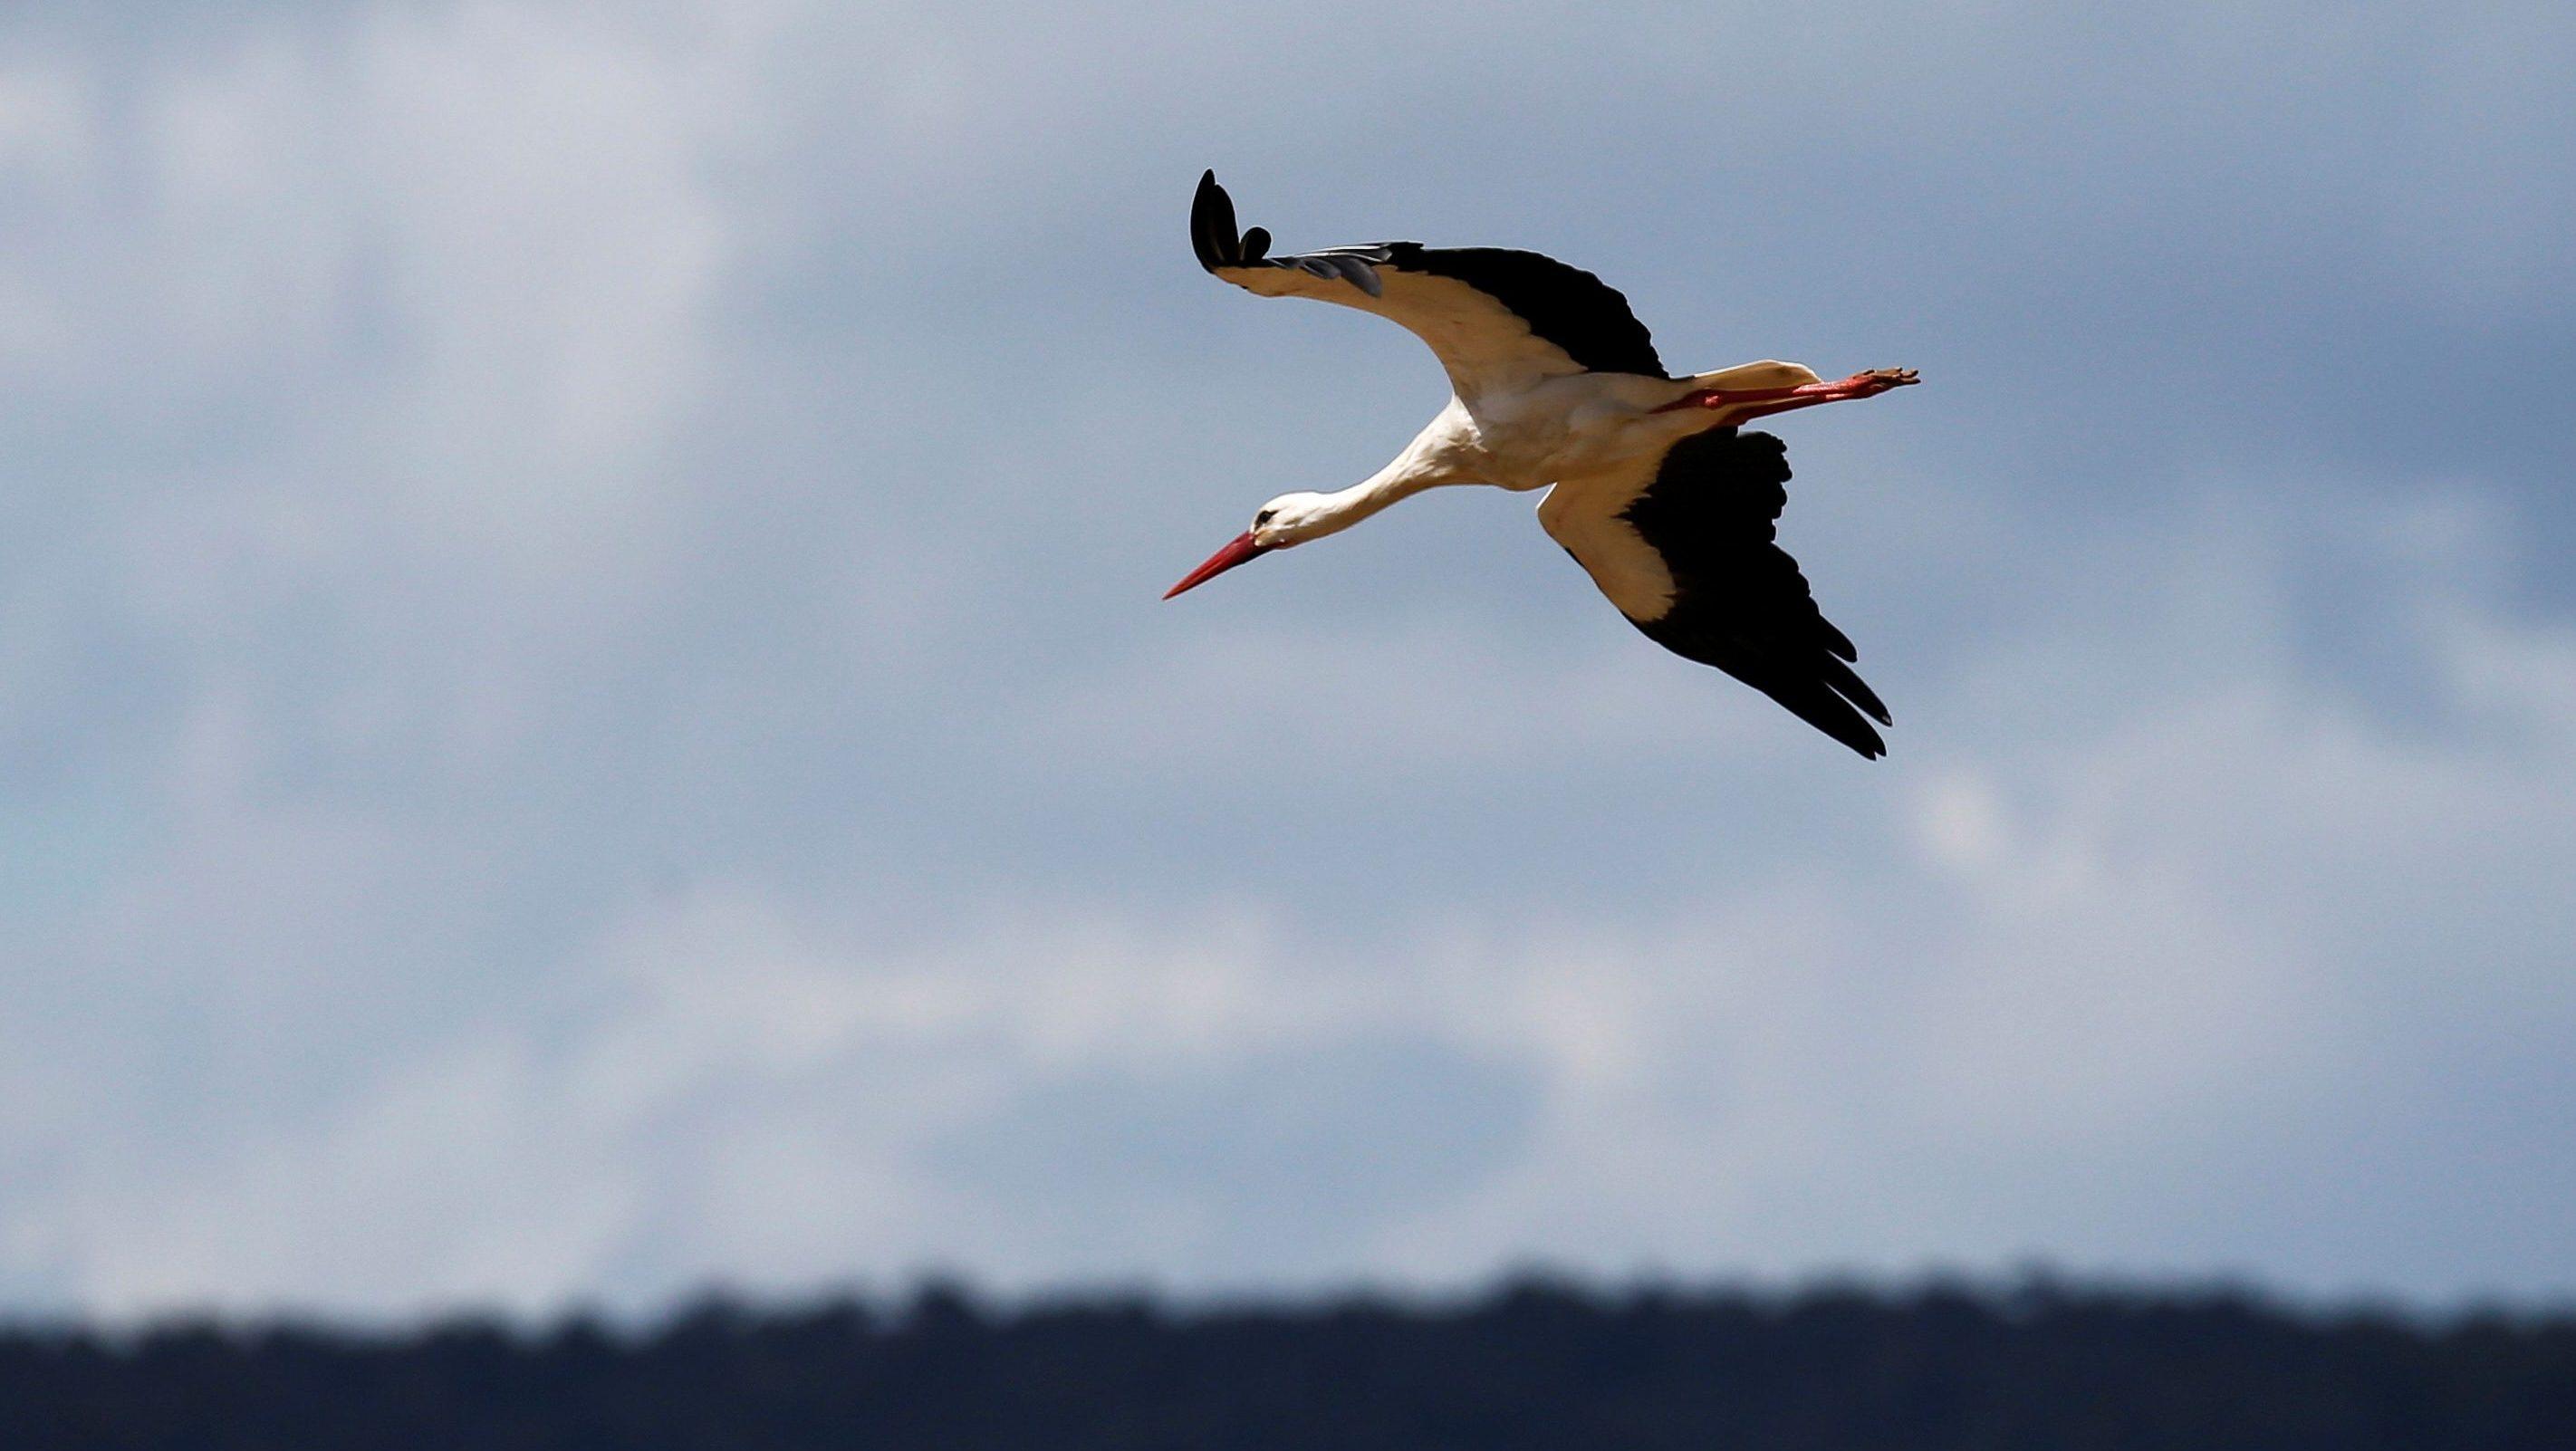 A white stork flies near Don Benito, Spain, April 13, 2016. REUTERS/Paul Hanna - D1AESYMPYOAA